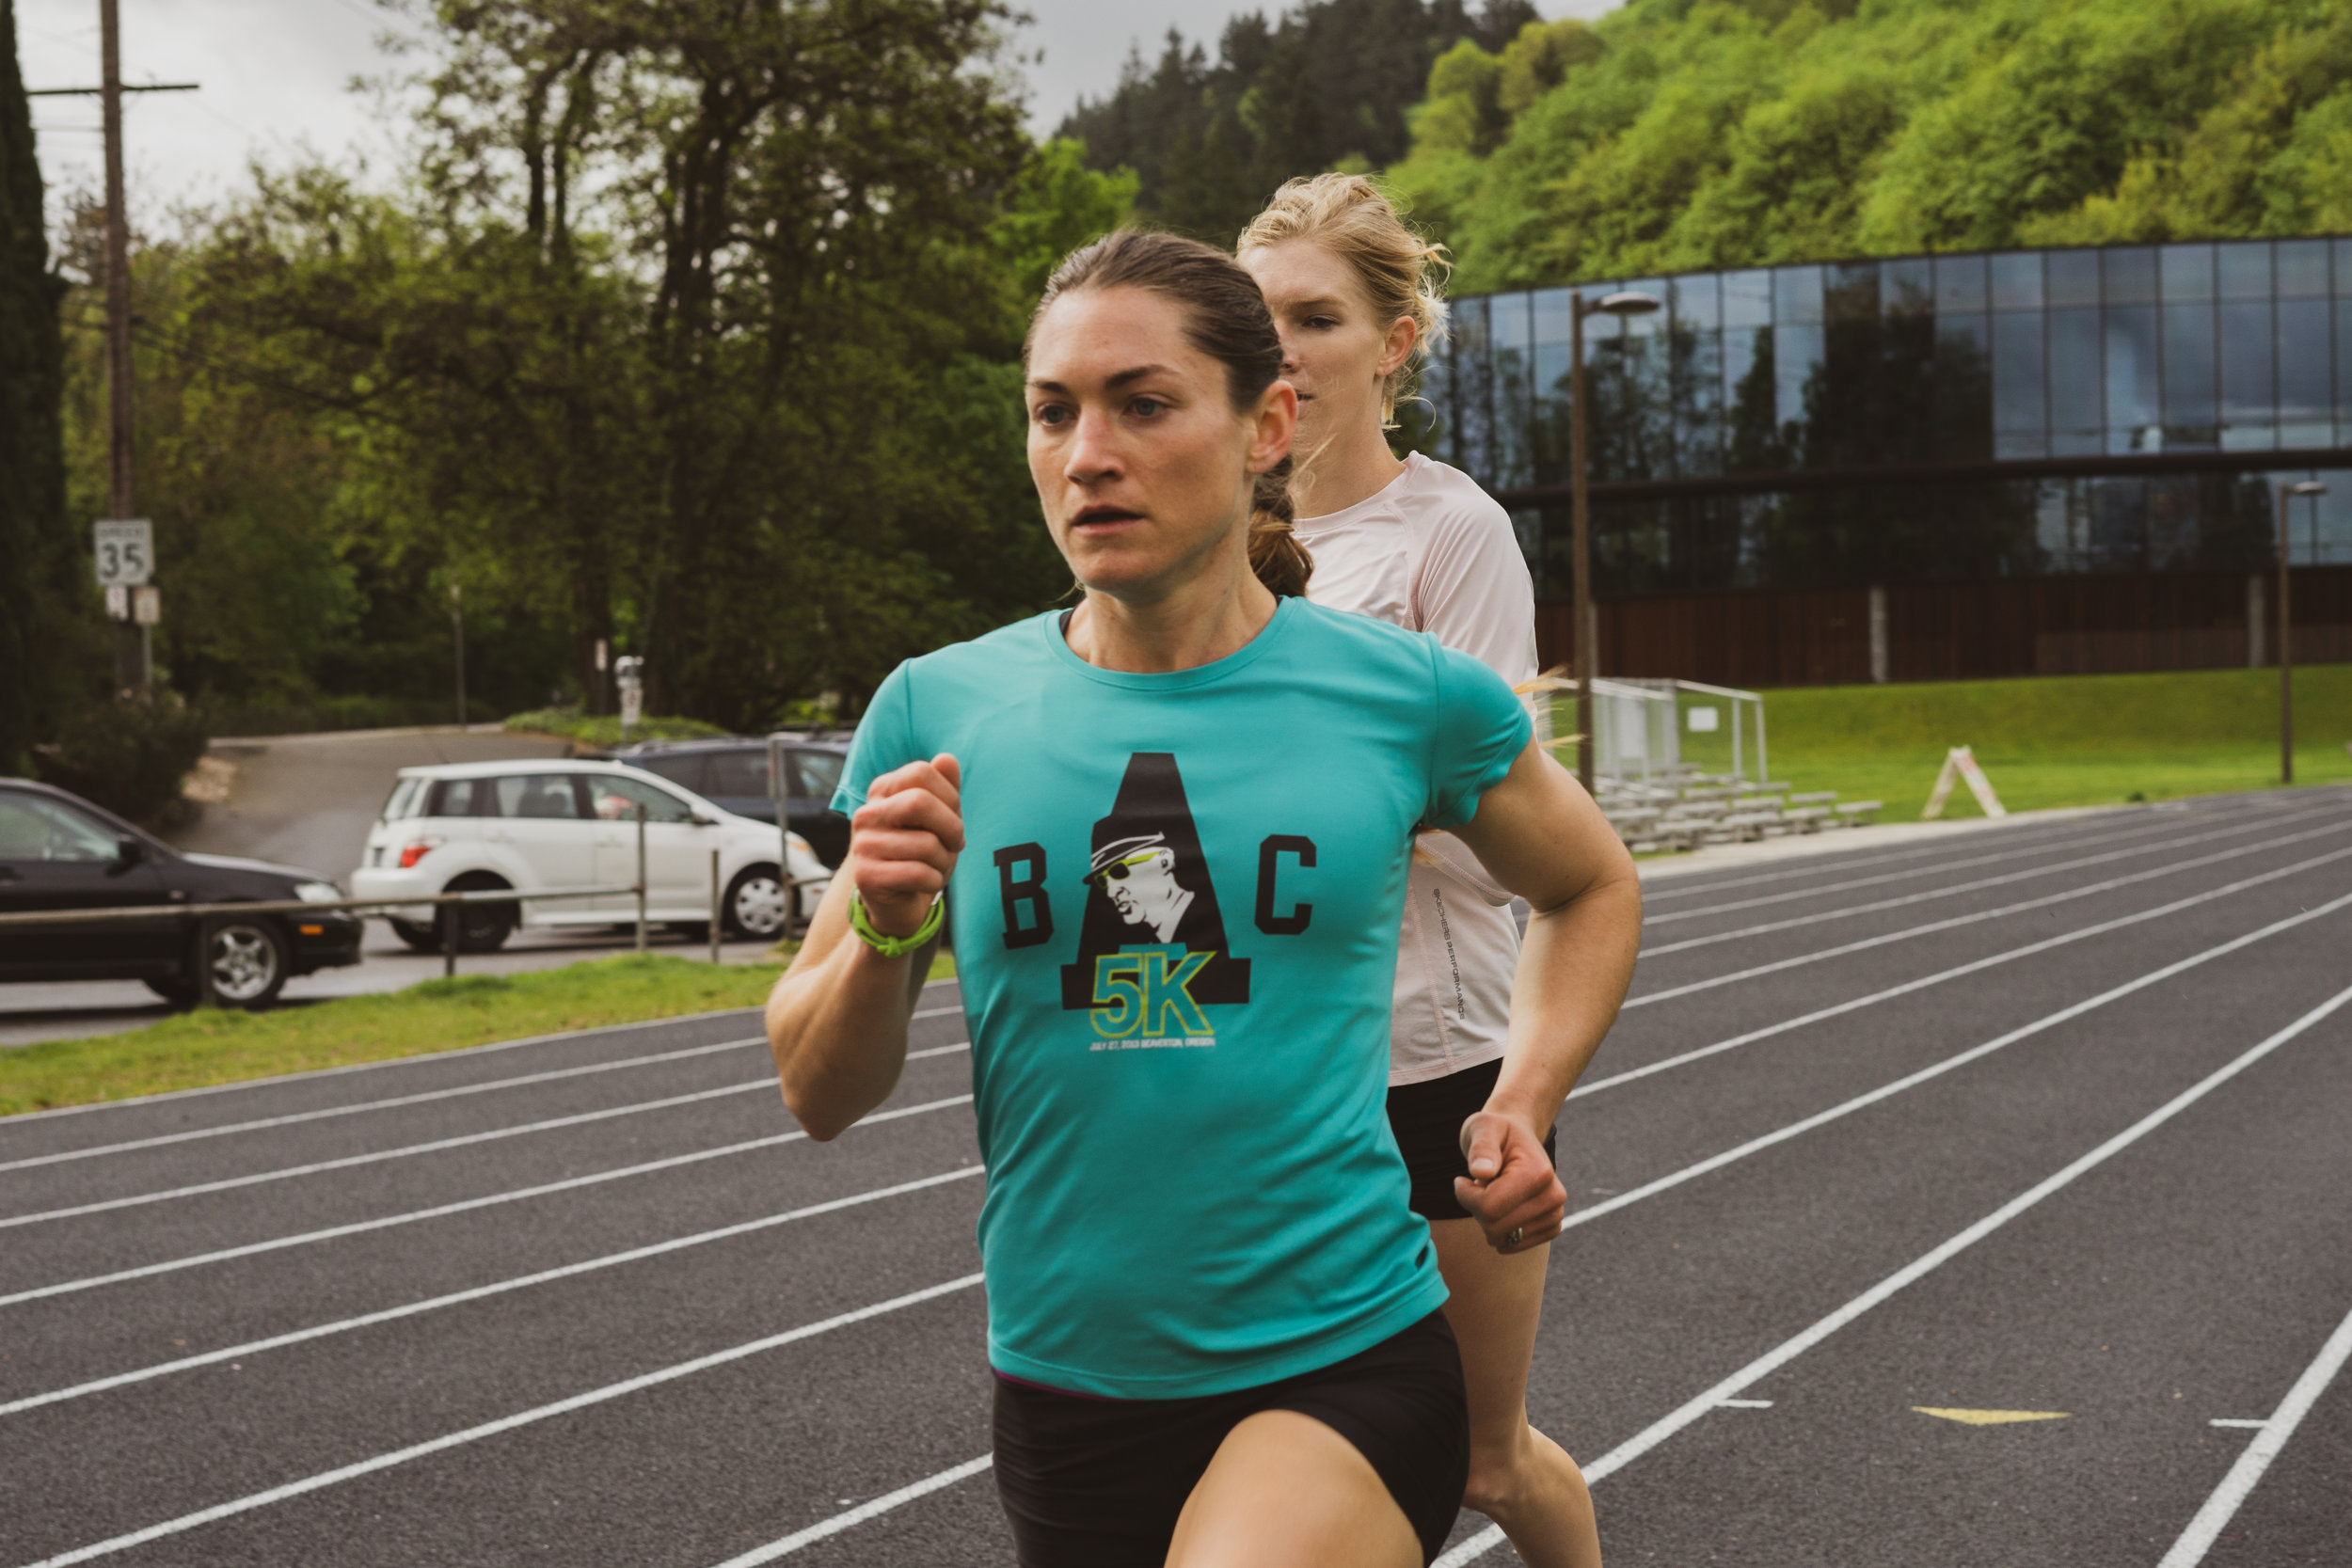 High Performance West Elite athlete, Anna Connor.